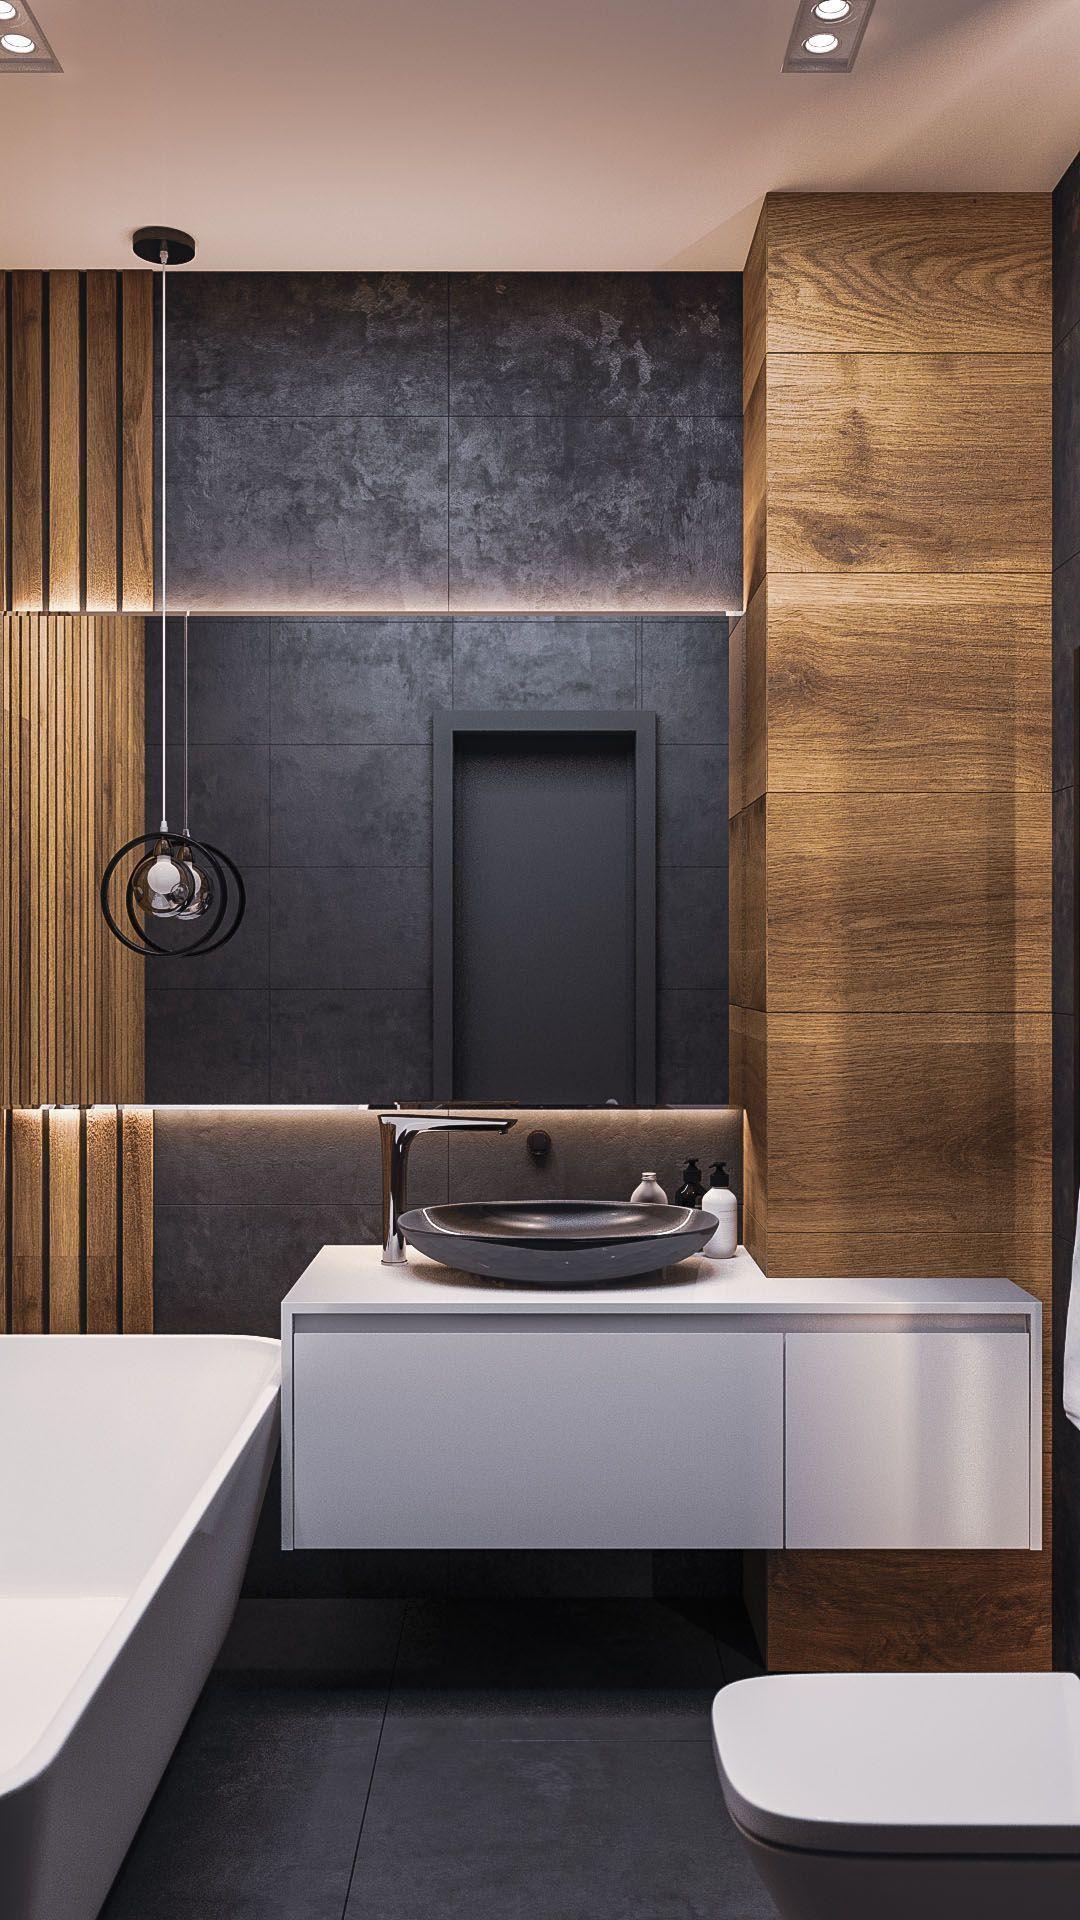 Luxury Bathroom Design Ideas Every Bathroom Remodel Begins With A Design Idea From Full Mas Bathroom Design Luxury Bathroom Interior Bathroom Interior Design Latest full bathroom wall